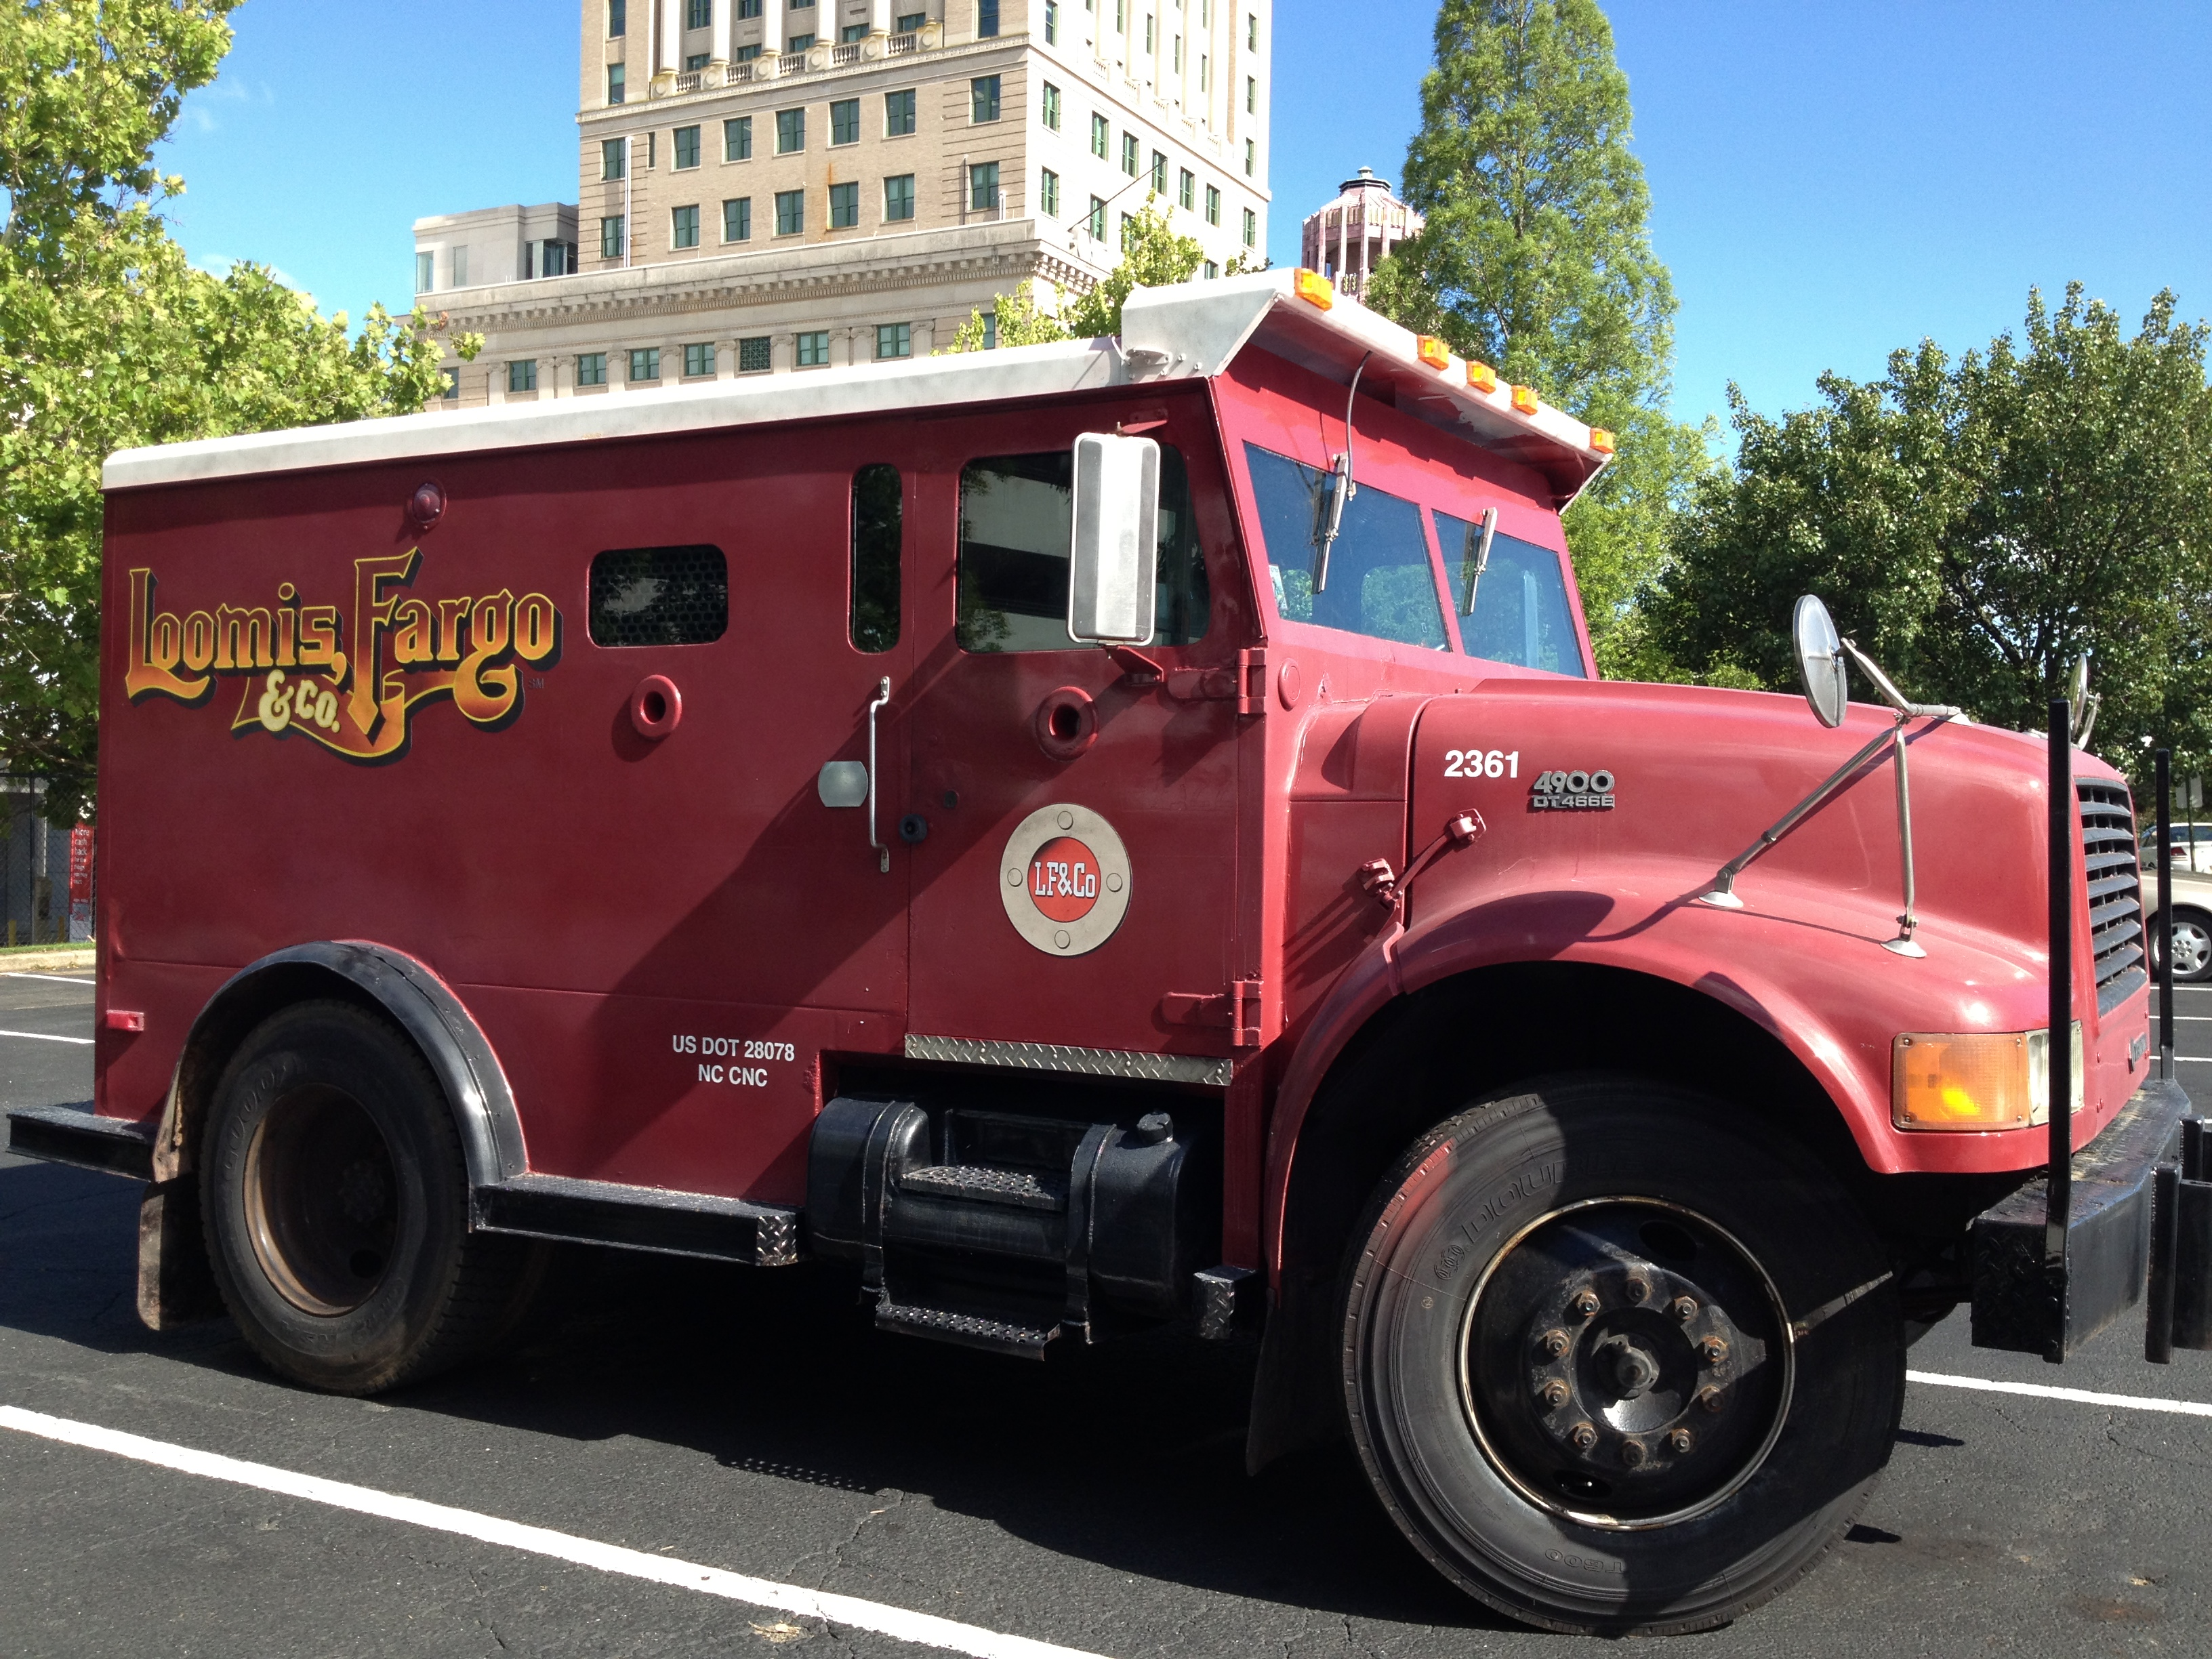 Loomis Fargo truck